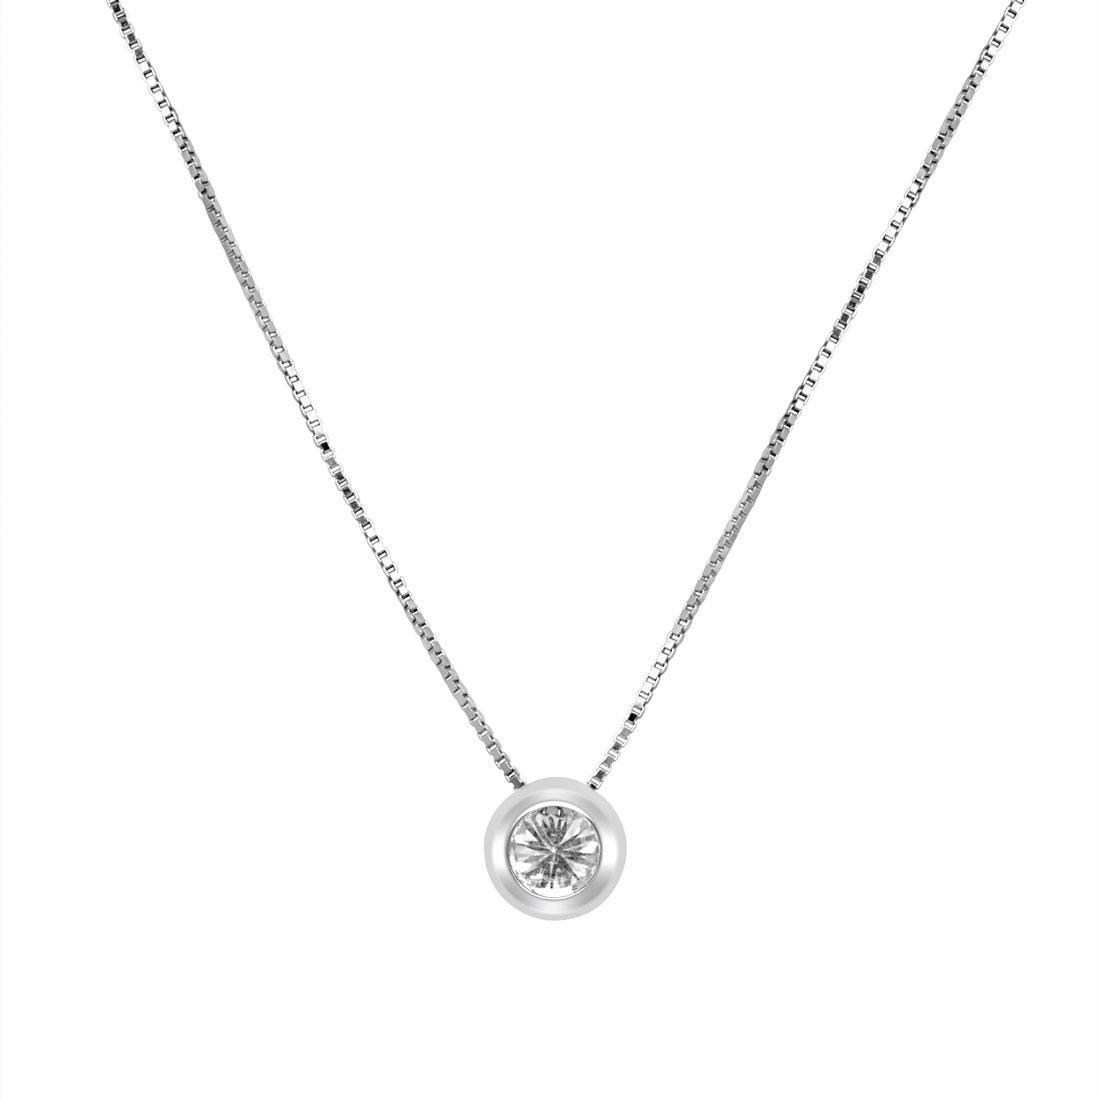 Necklace with diamond - ALFIERI & ST. JOHN